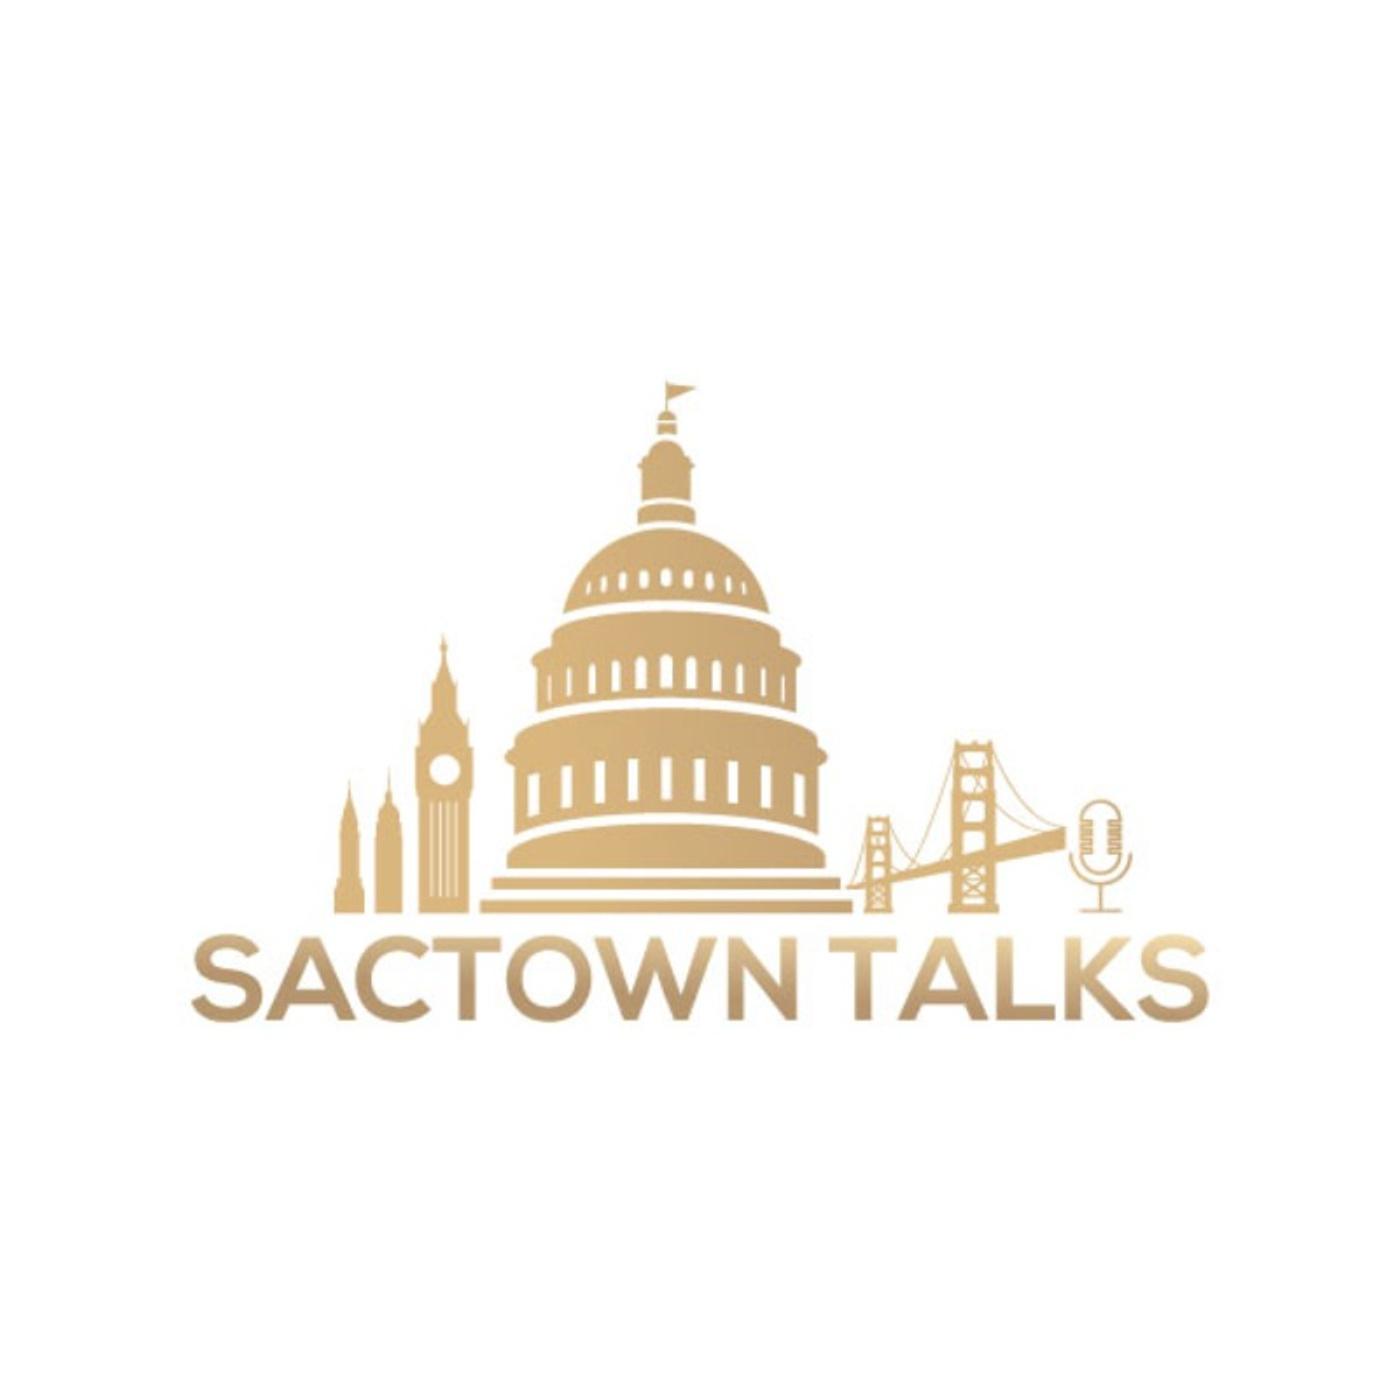 SacTown Talks by The Nooner W/ Scott Lay